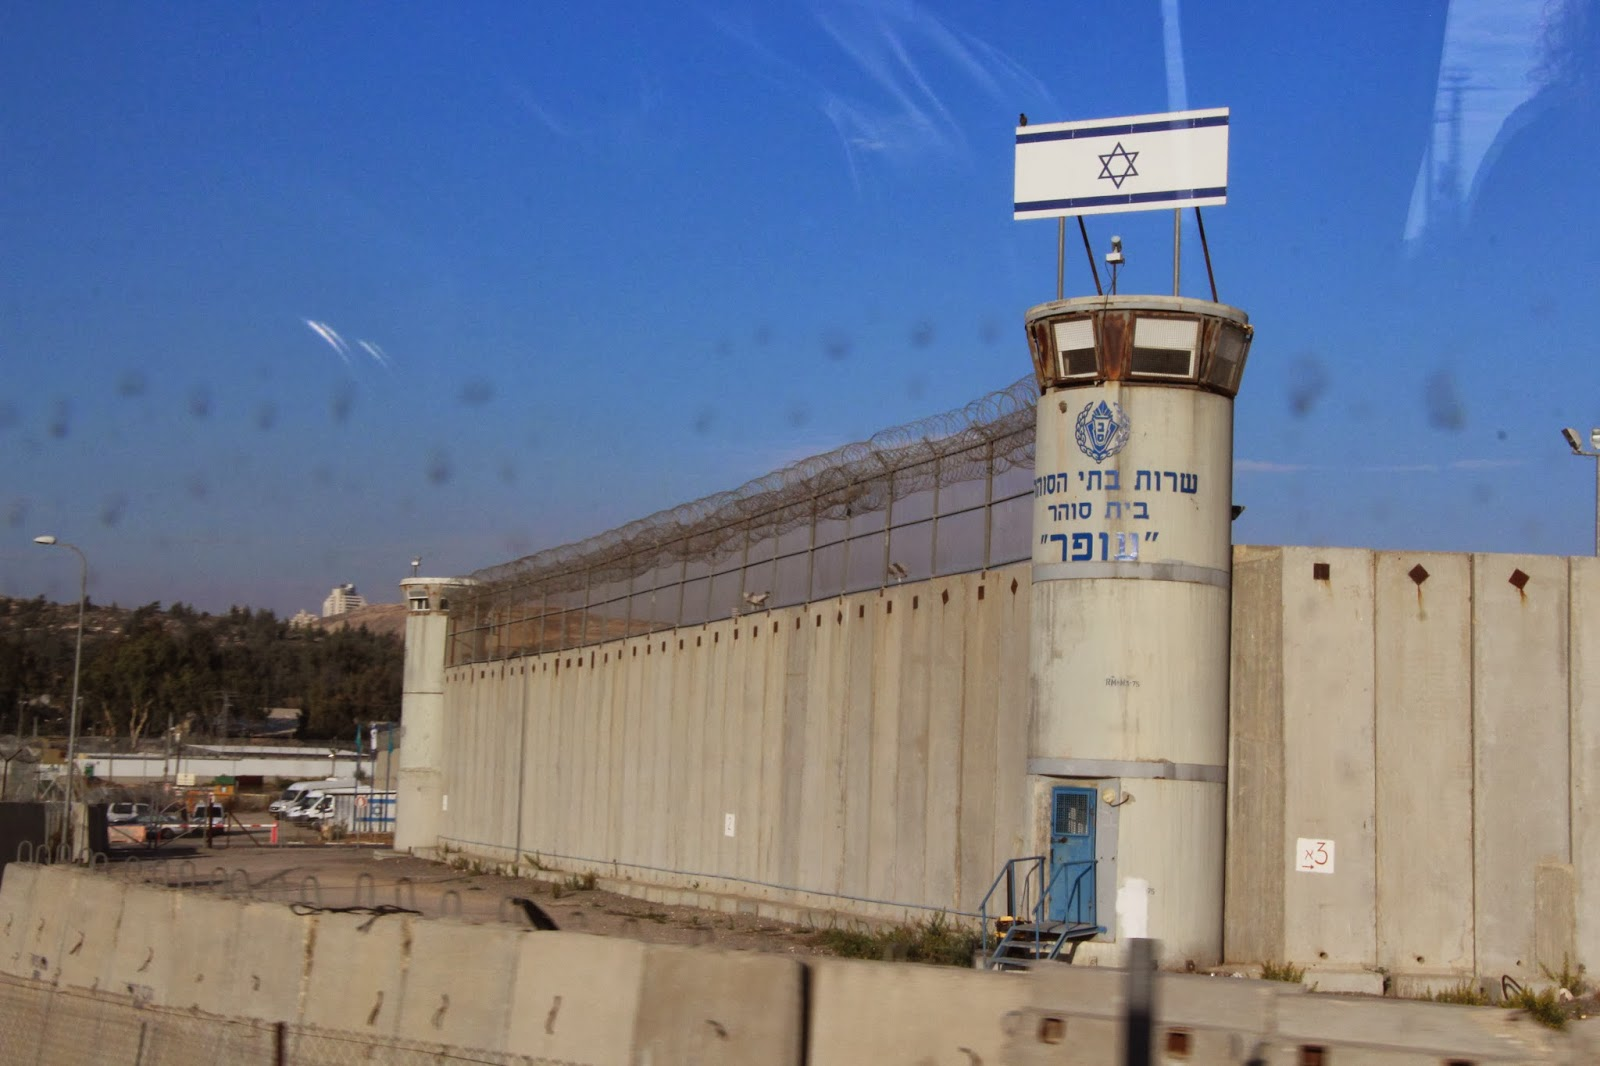 TAHANAN PALESTINA KOMA DI PENJARA ISRAEL